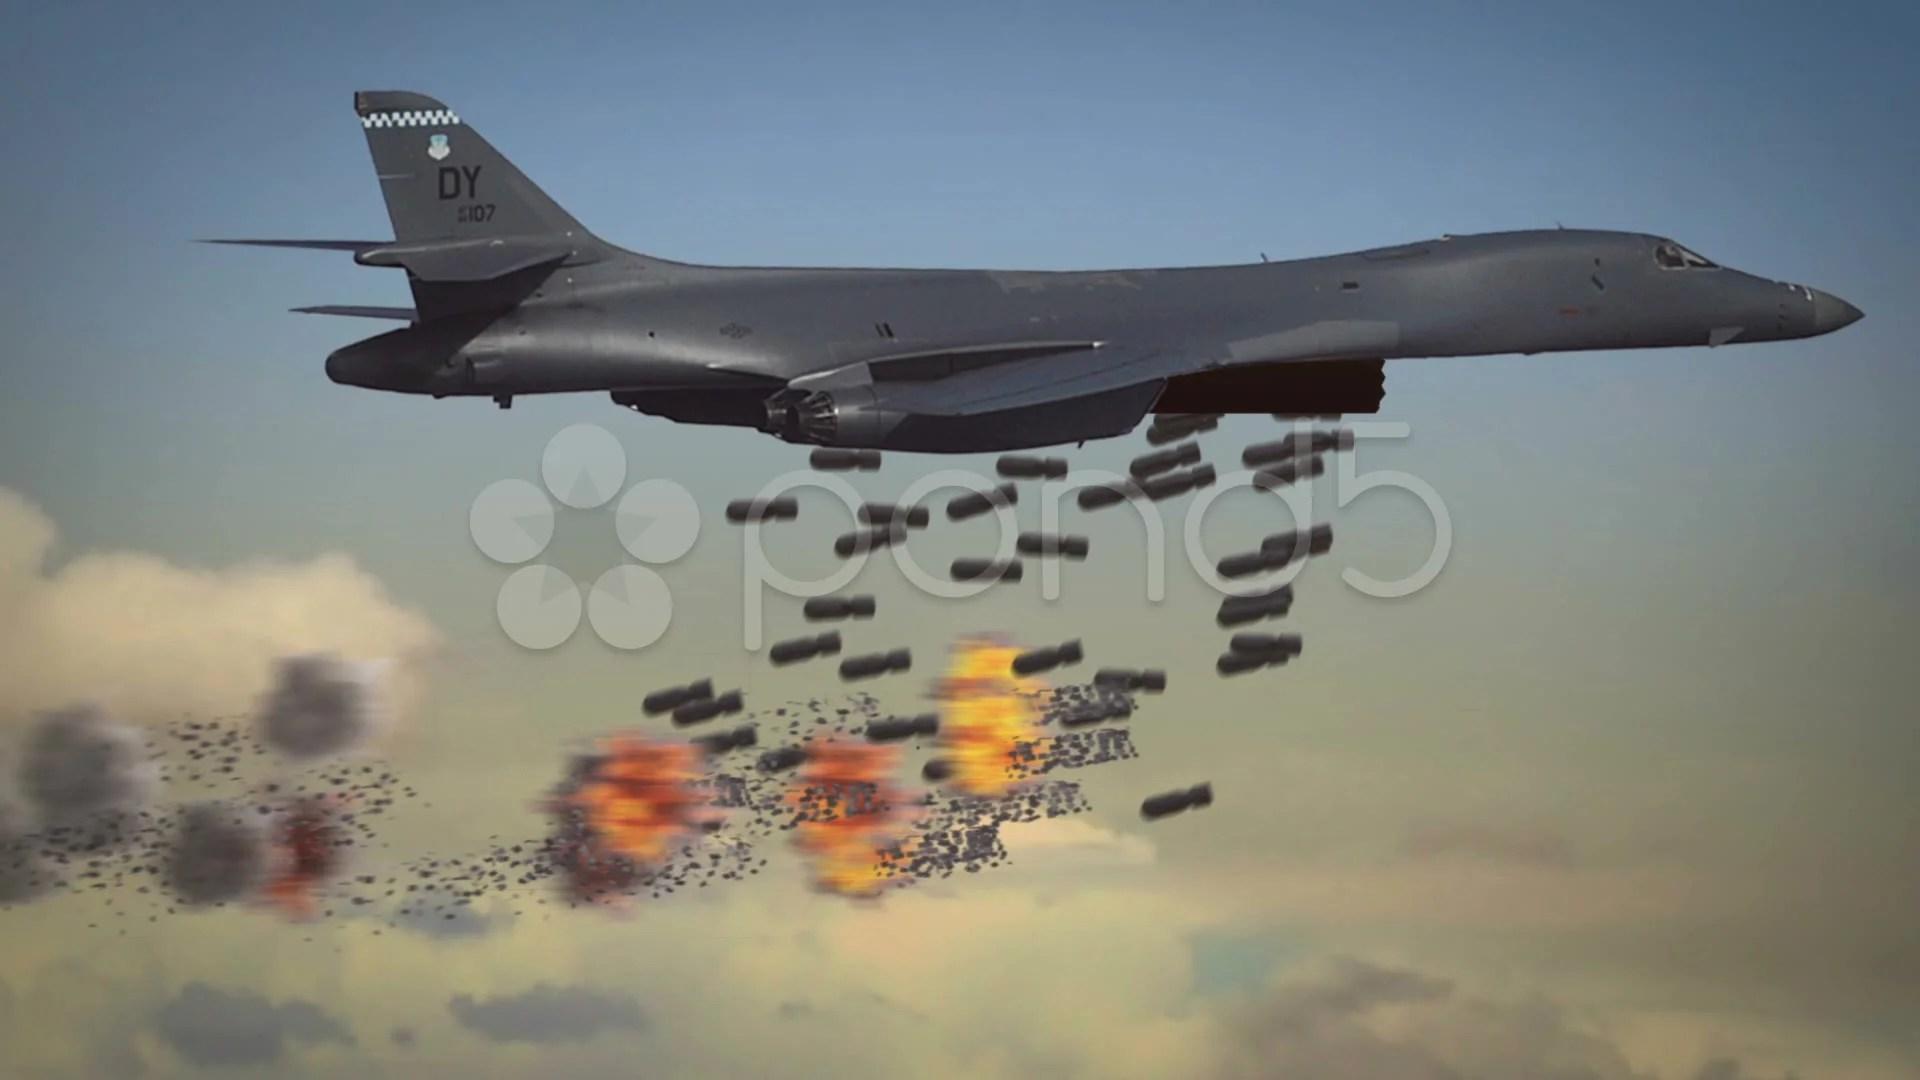 Black Desert Hd Wallpaper B1 Bomber In A Cluster Bomb Attack Against A Tank Column